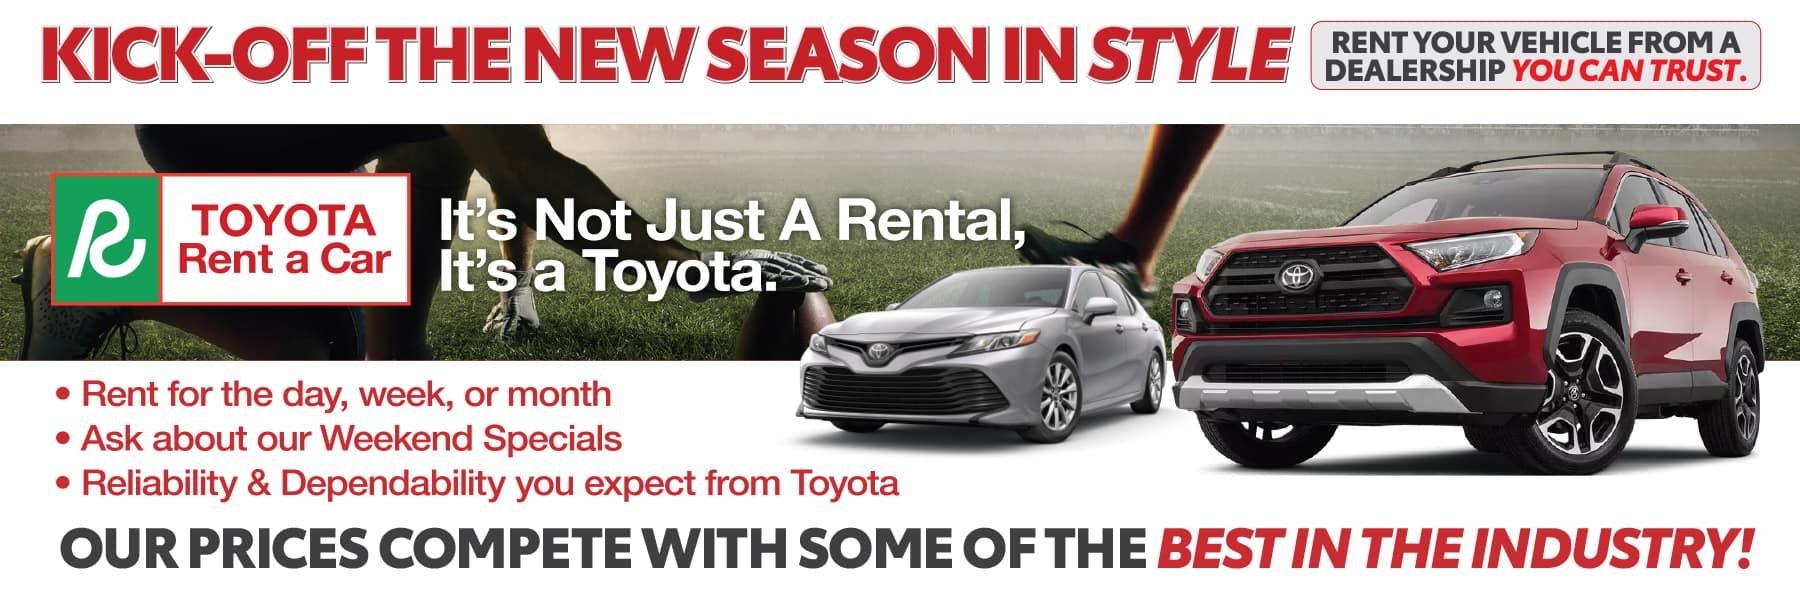 Toyota Rent A Car in Boerne, TX